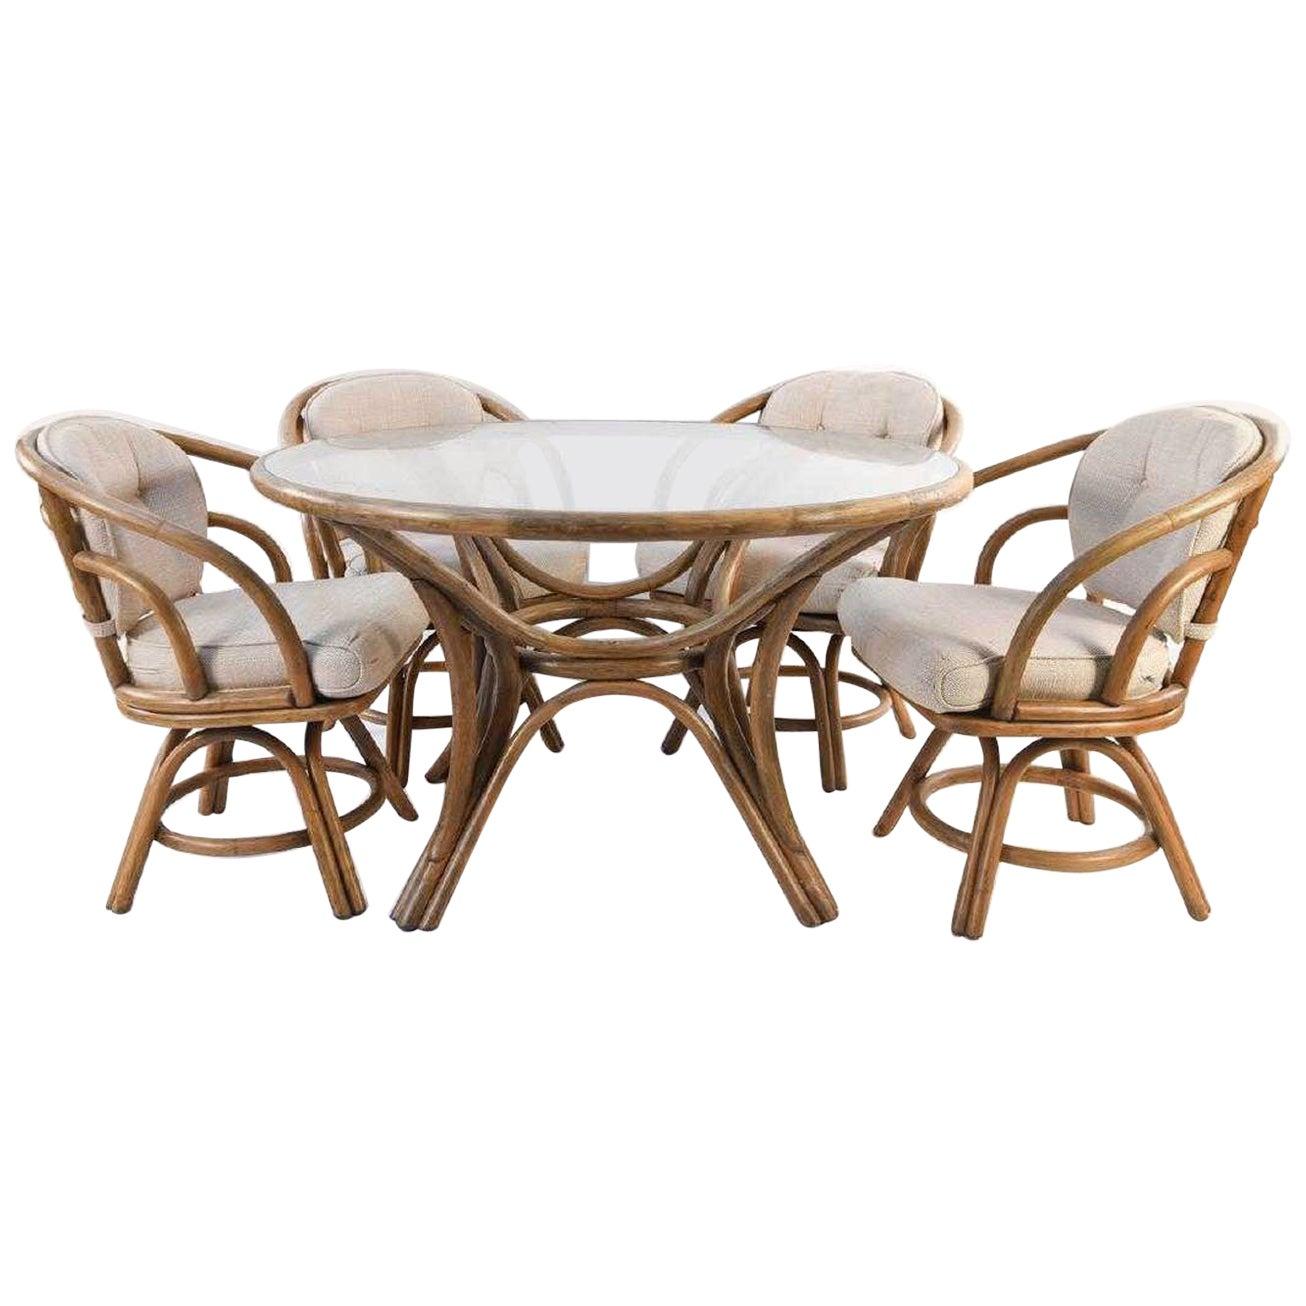 Brown Jordan Bentwood Rattan Table and Chairs Set